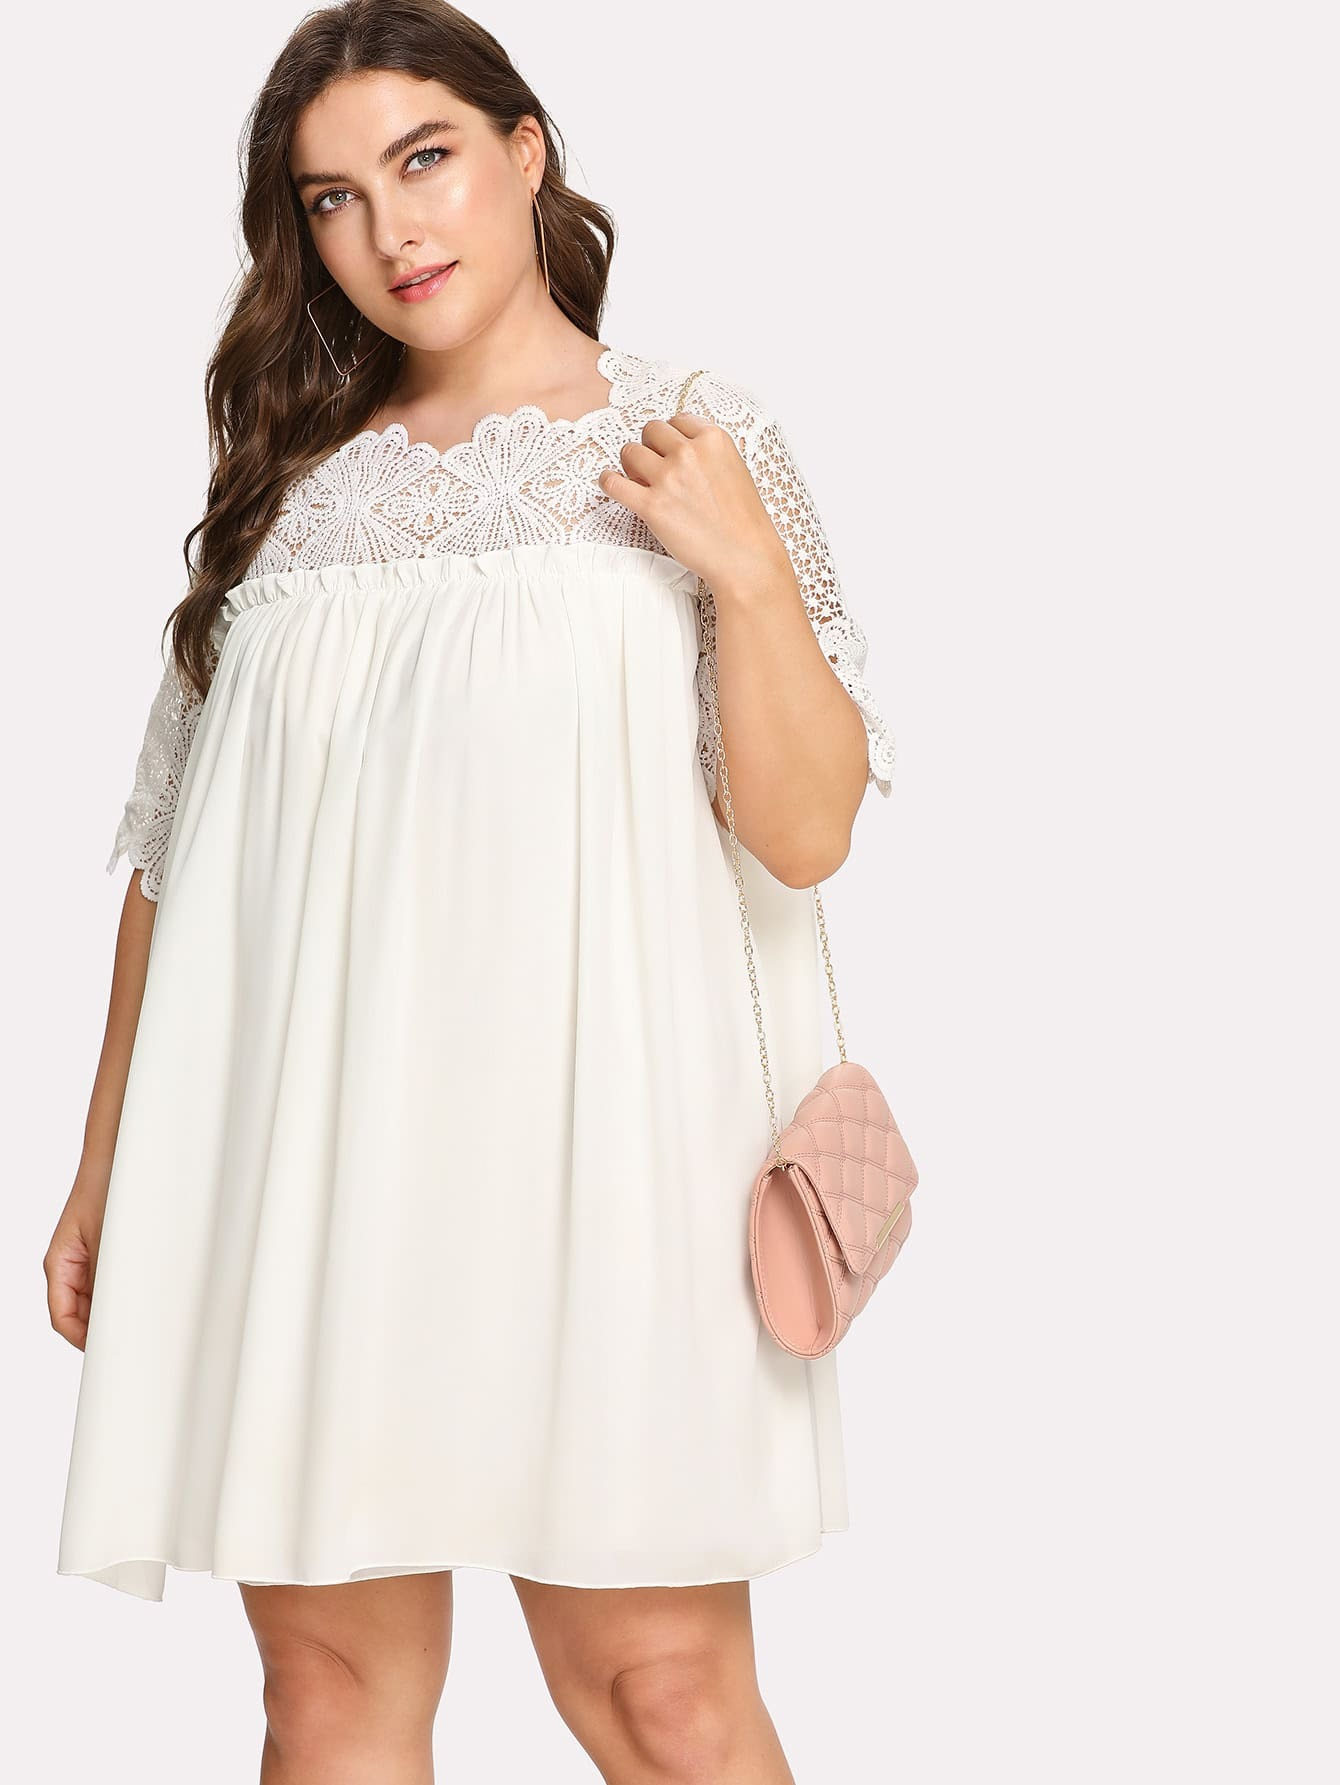 Lace Crochet Frill Detail Smock Dress Shein Sheinside